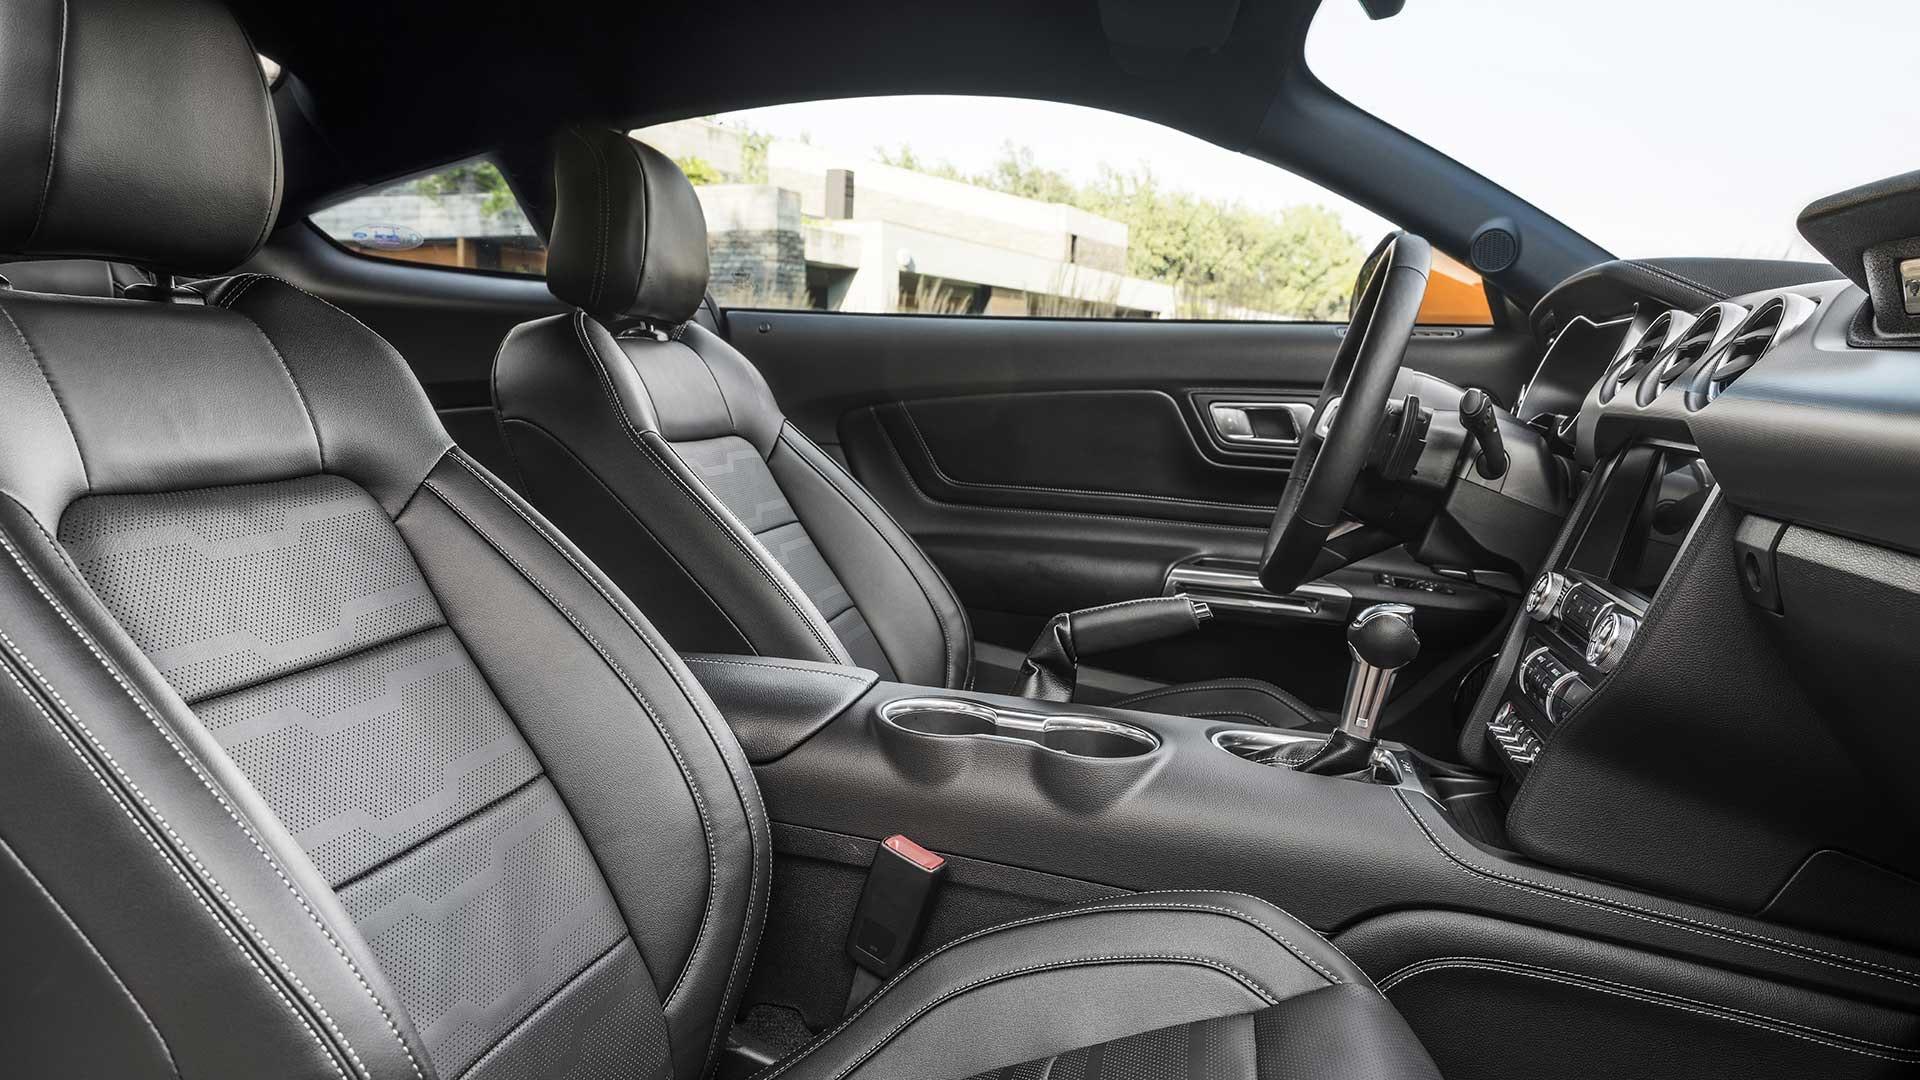 Ford Mustang indeni